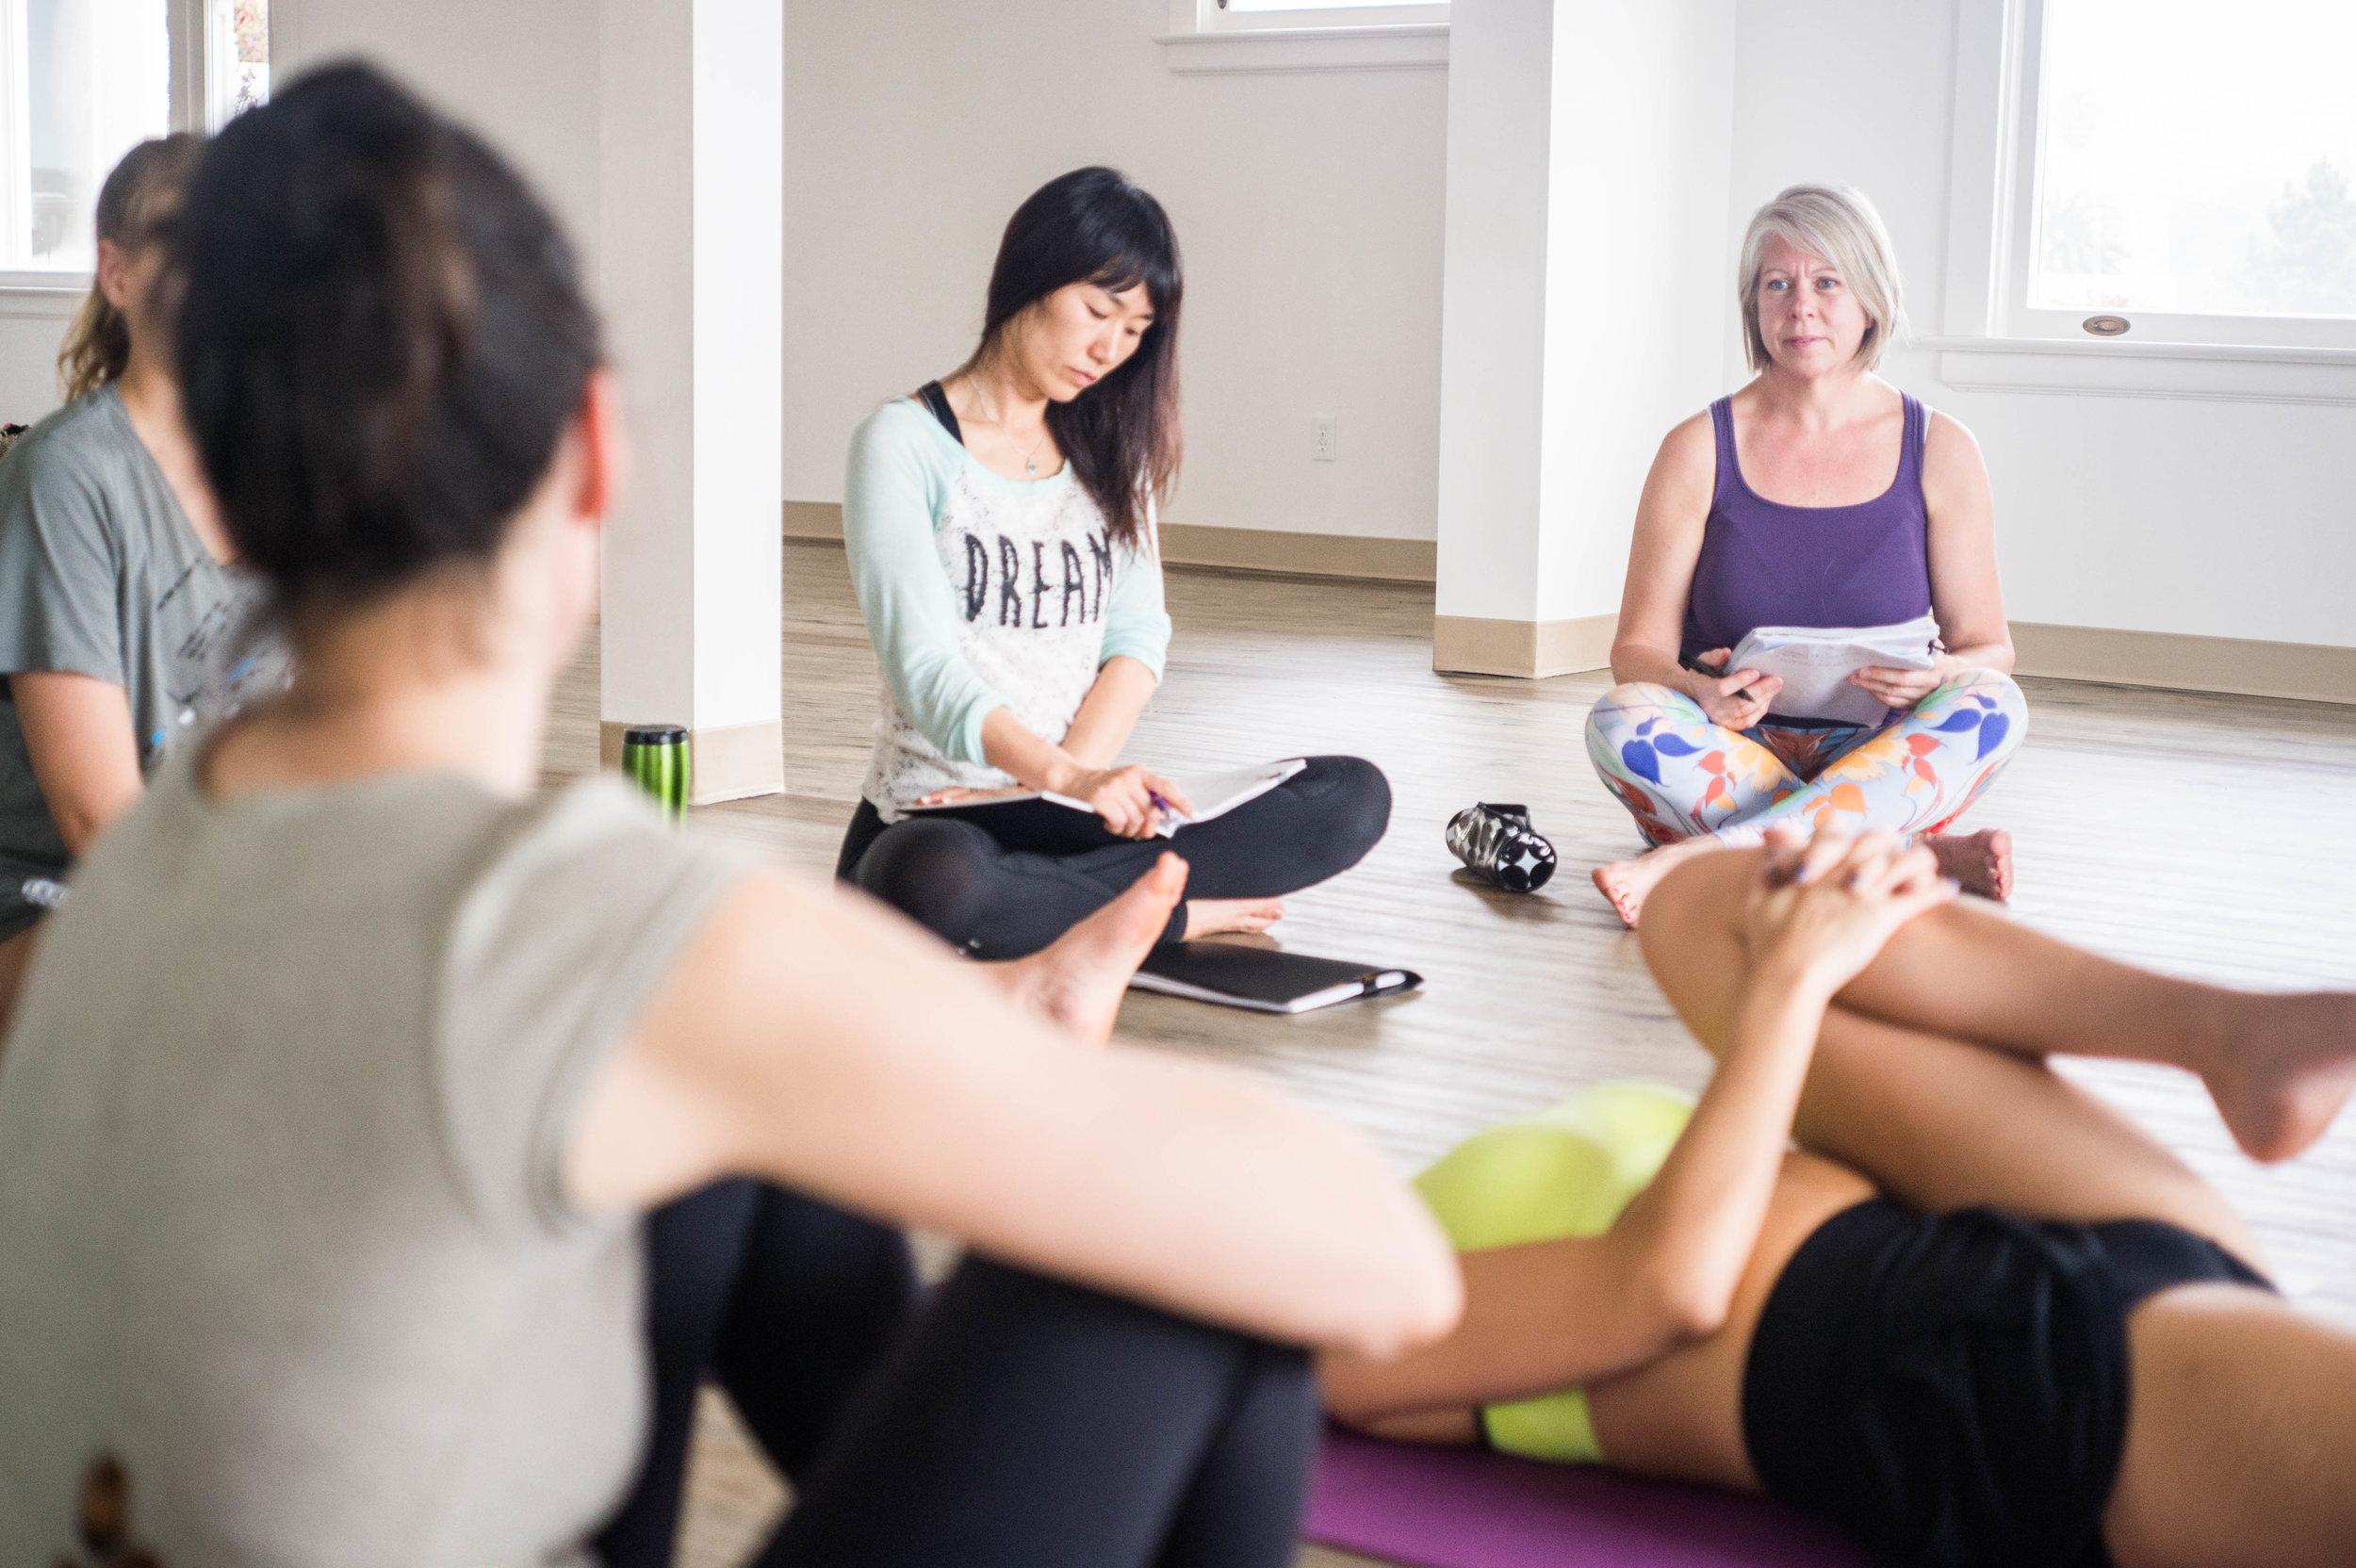 flow-yoga-teacher-training-santa-barbara-lecture.jpg